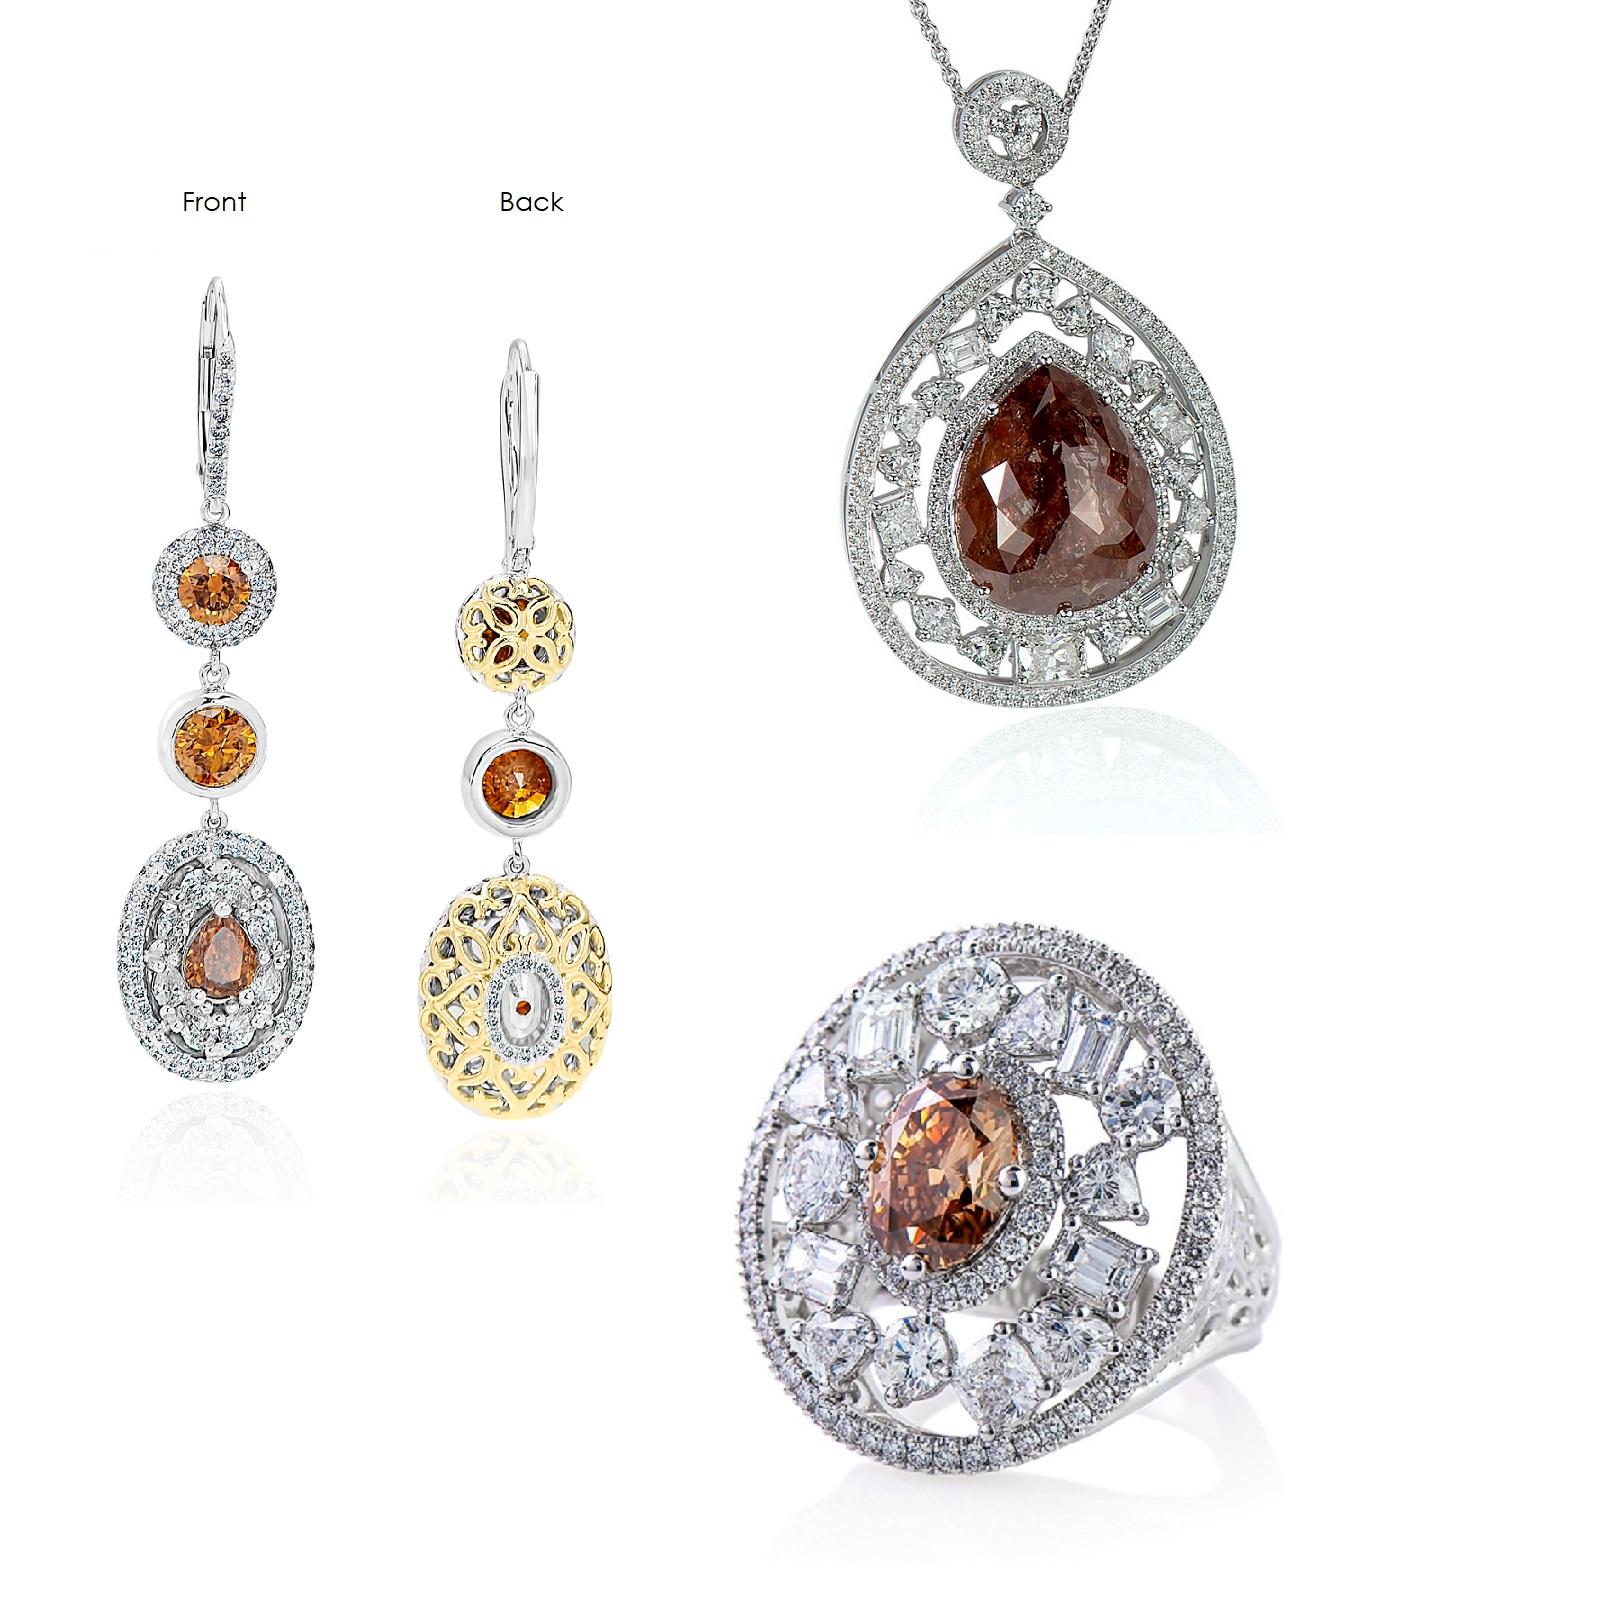 Mixed Brown & Orange Diamond Ring, Pendant & Earrings Set (43.13ct TW)